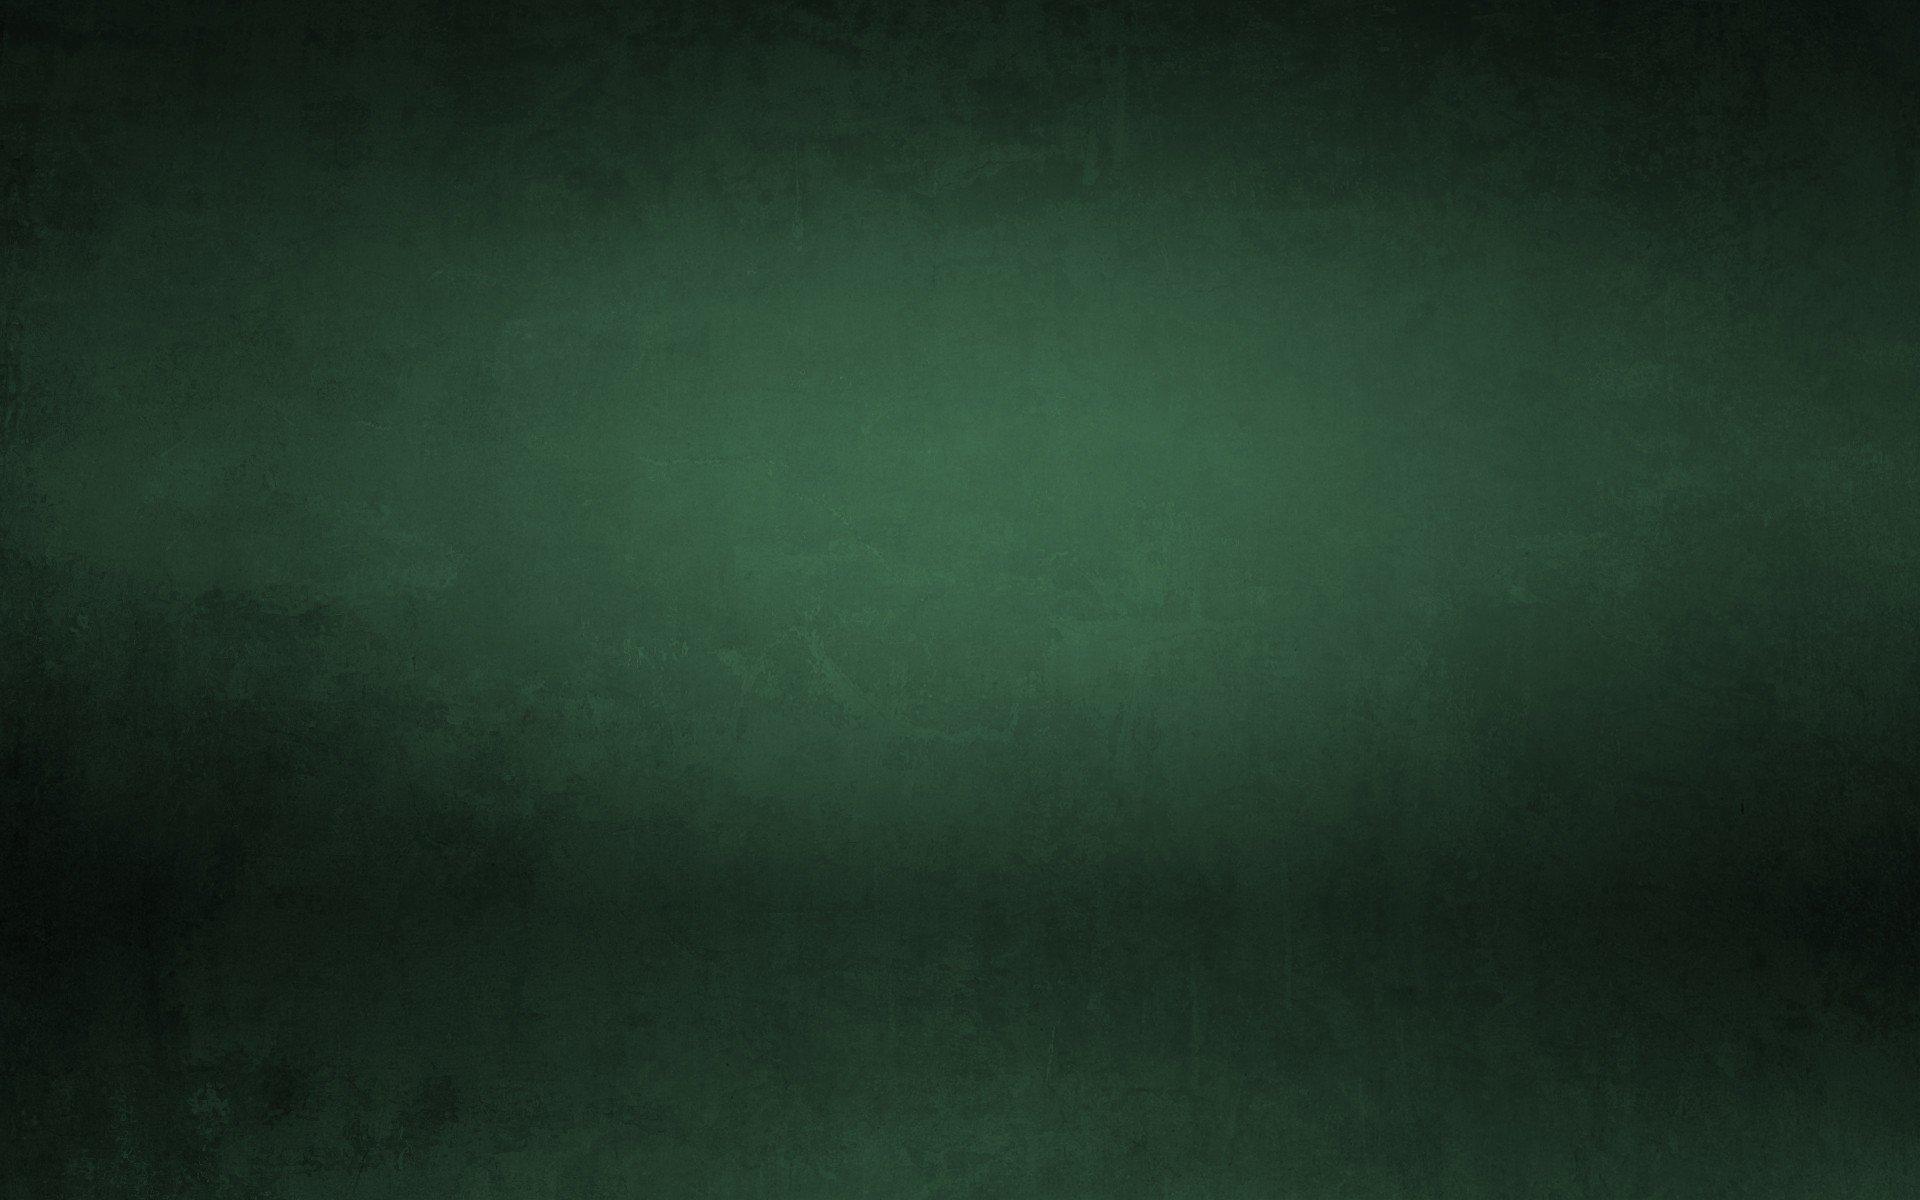 76 Dark Green Wallpaper On Wallpapersafari